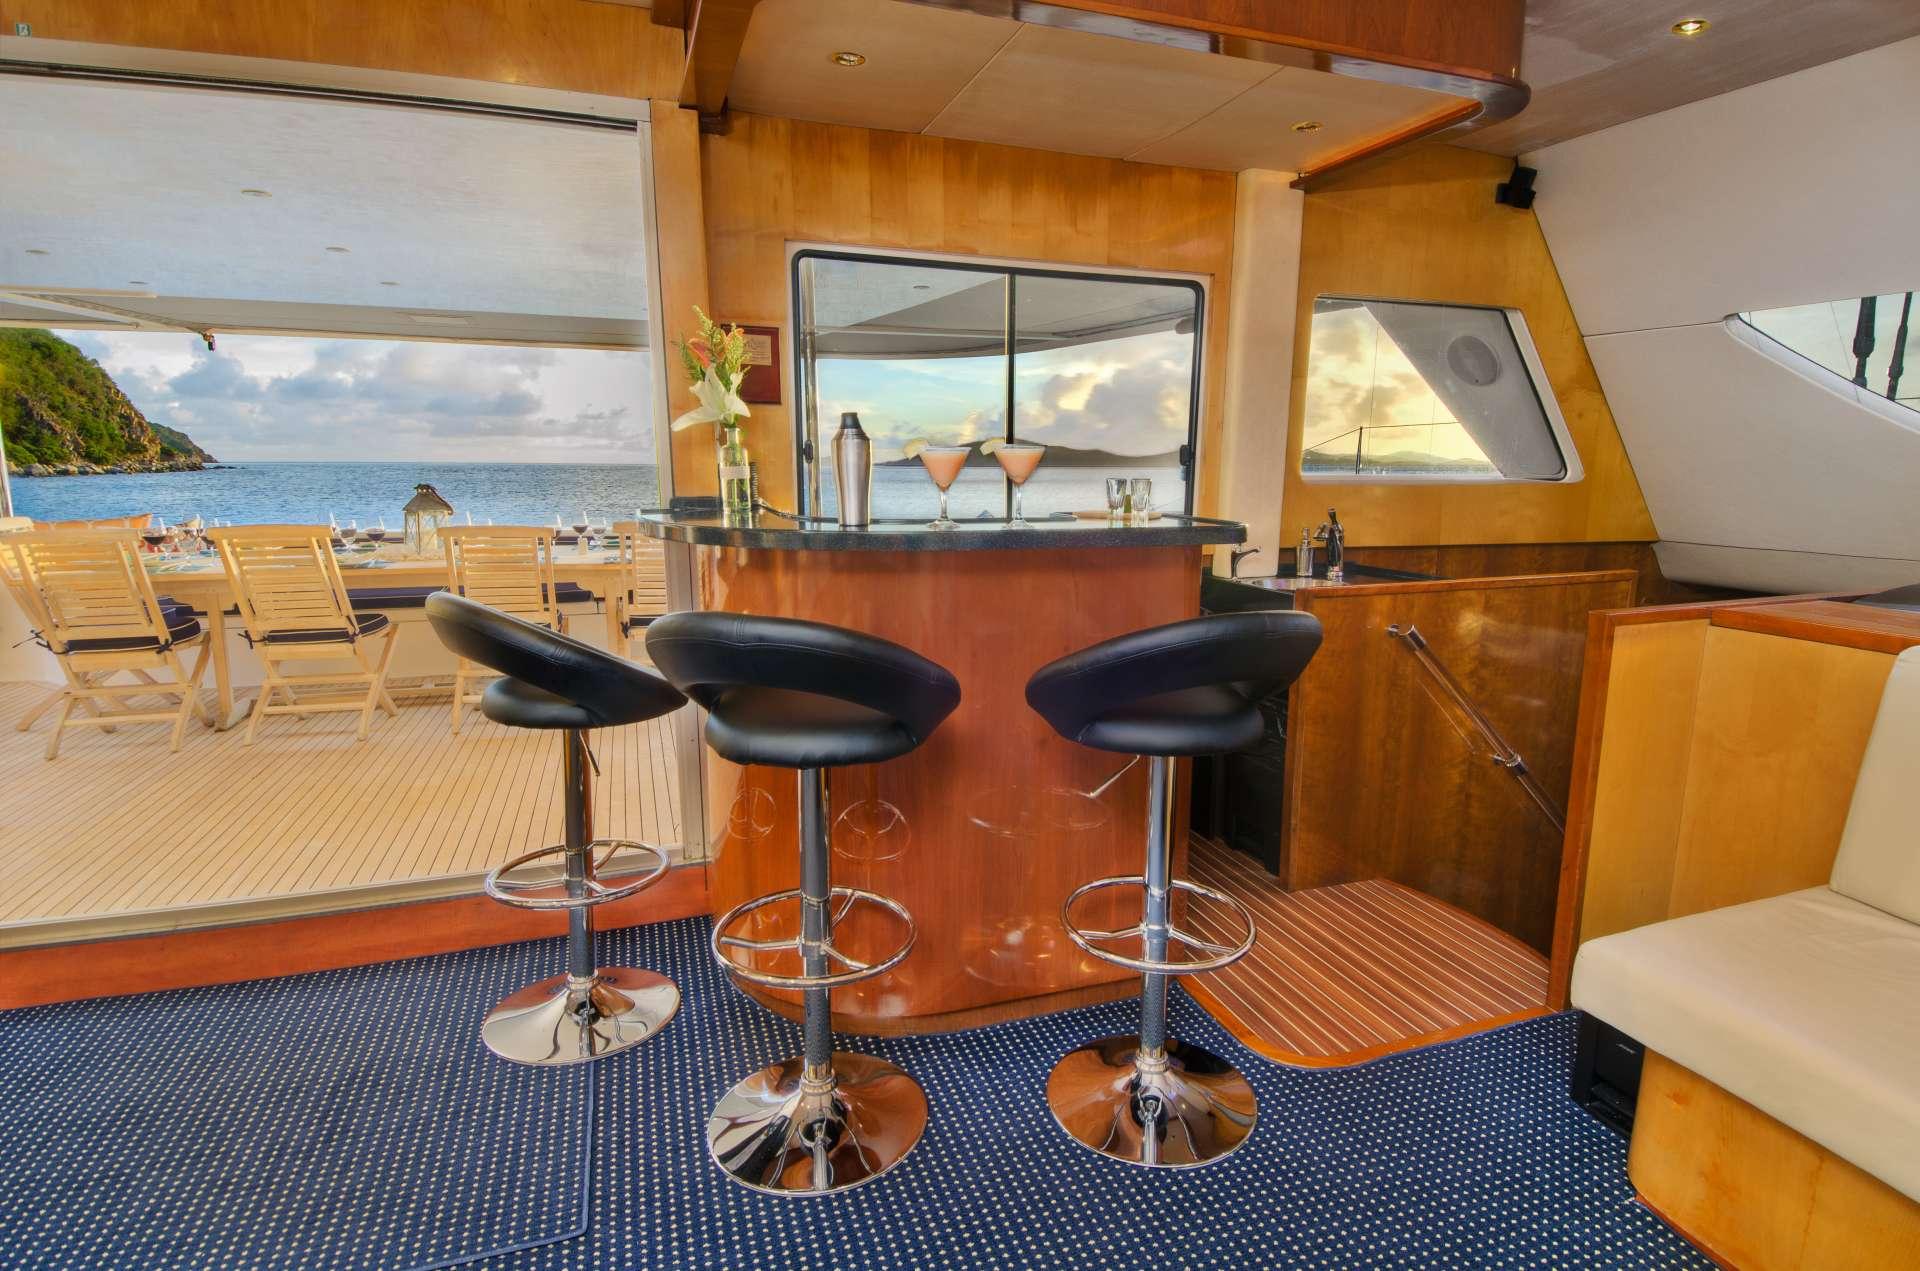 ZINGARA yacht image # 12